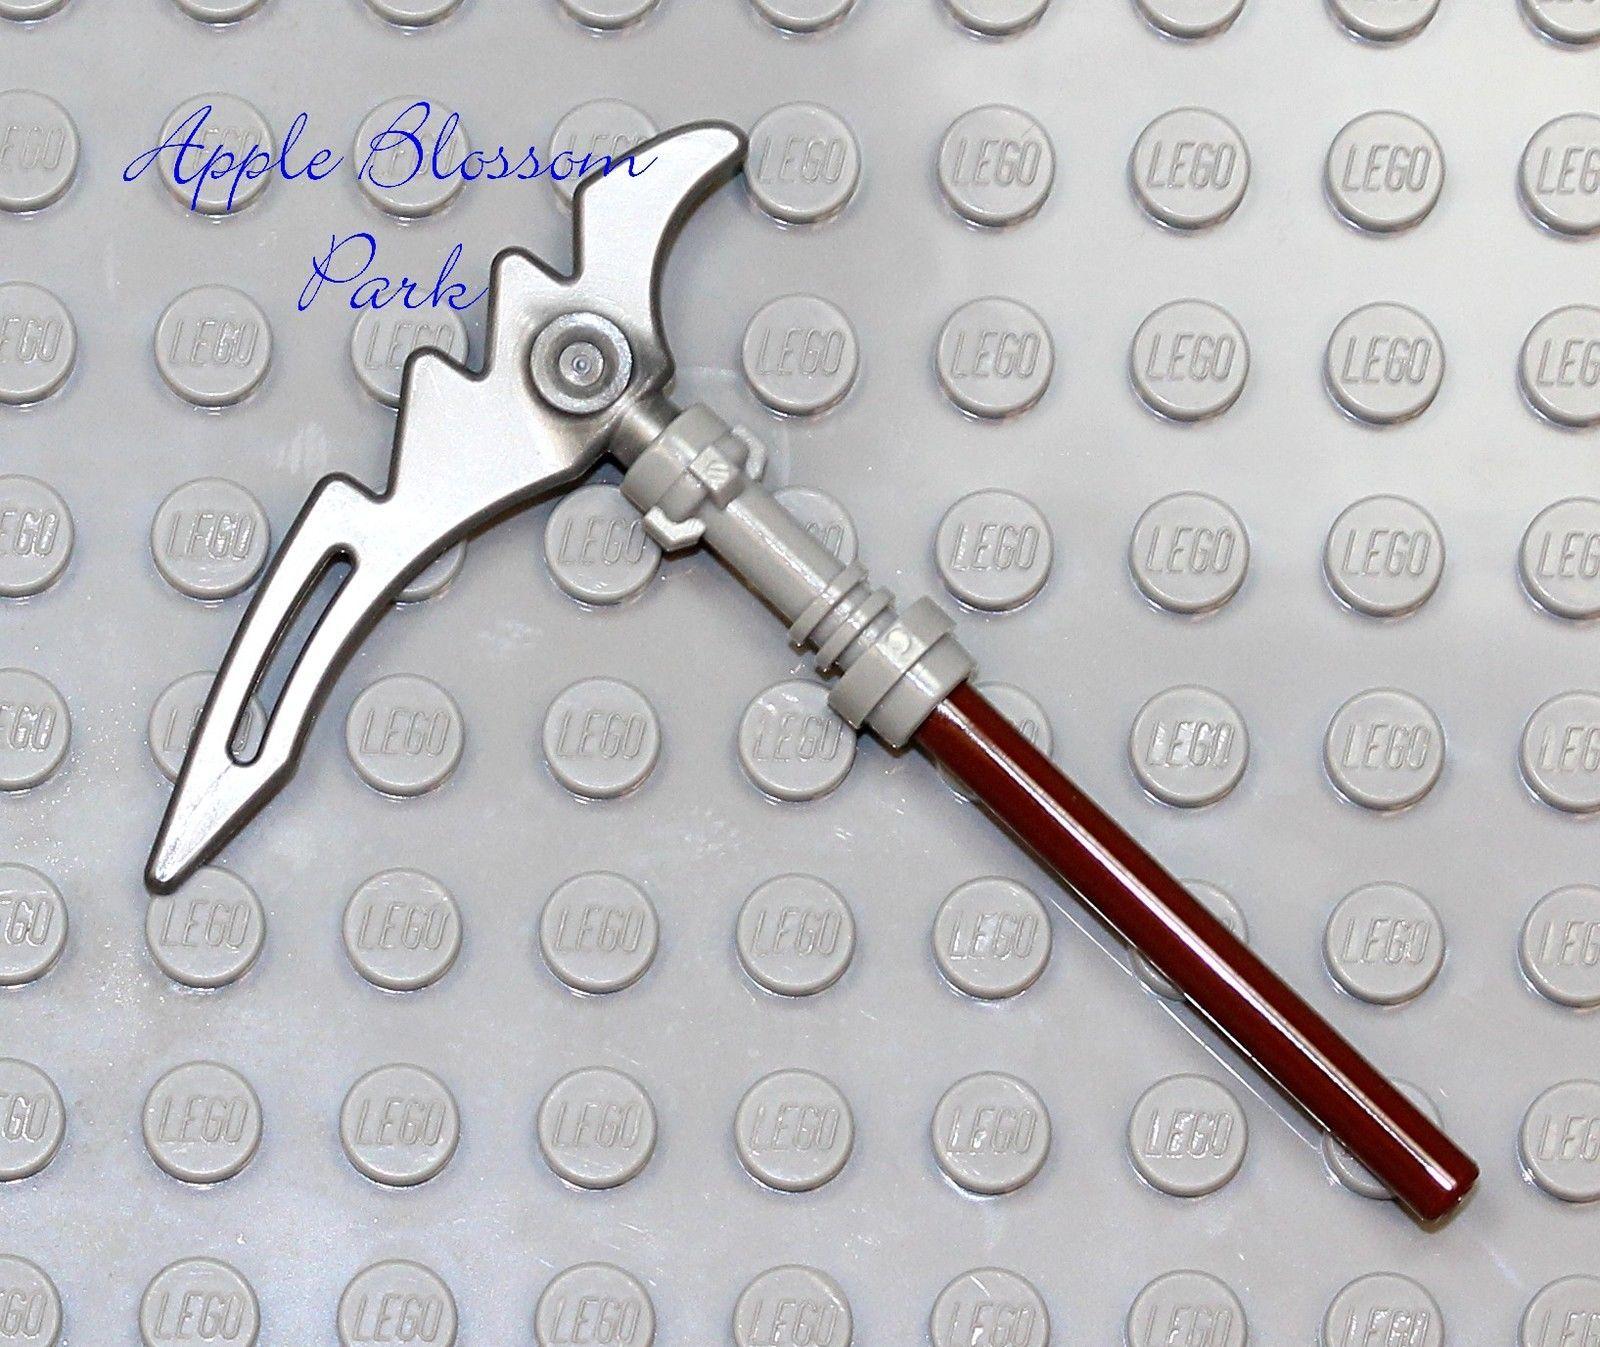 Castle Skeleton Gray Tool Weapon NEW Lego Ninjago Ninja Minifig SCYTHE BLADE